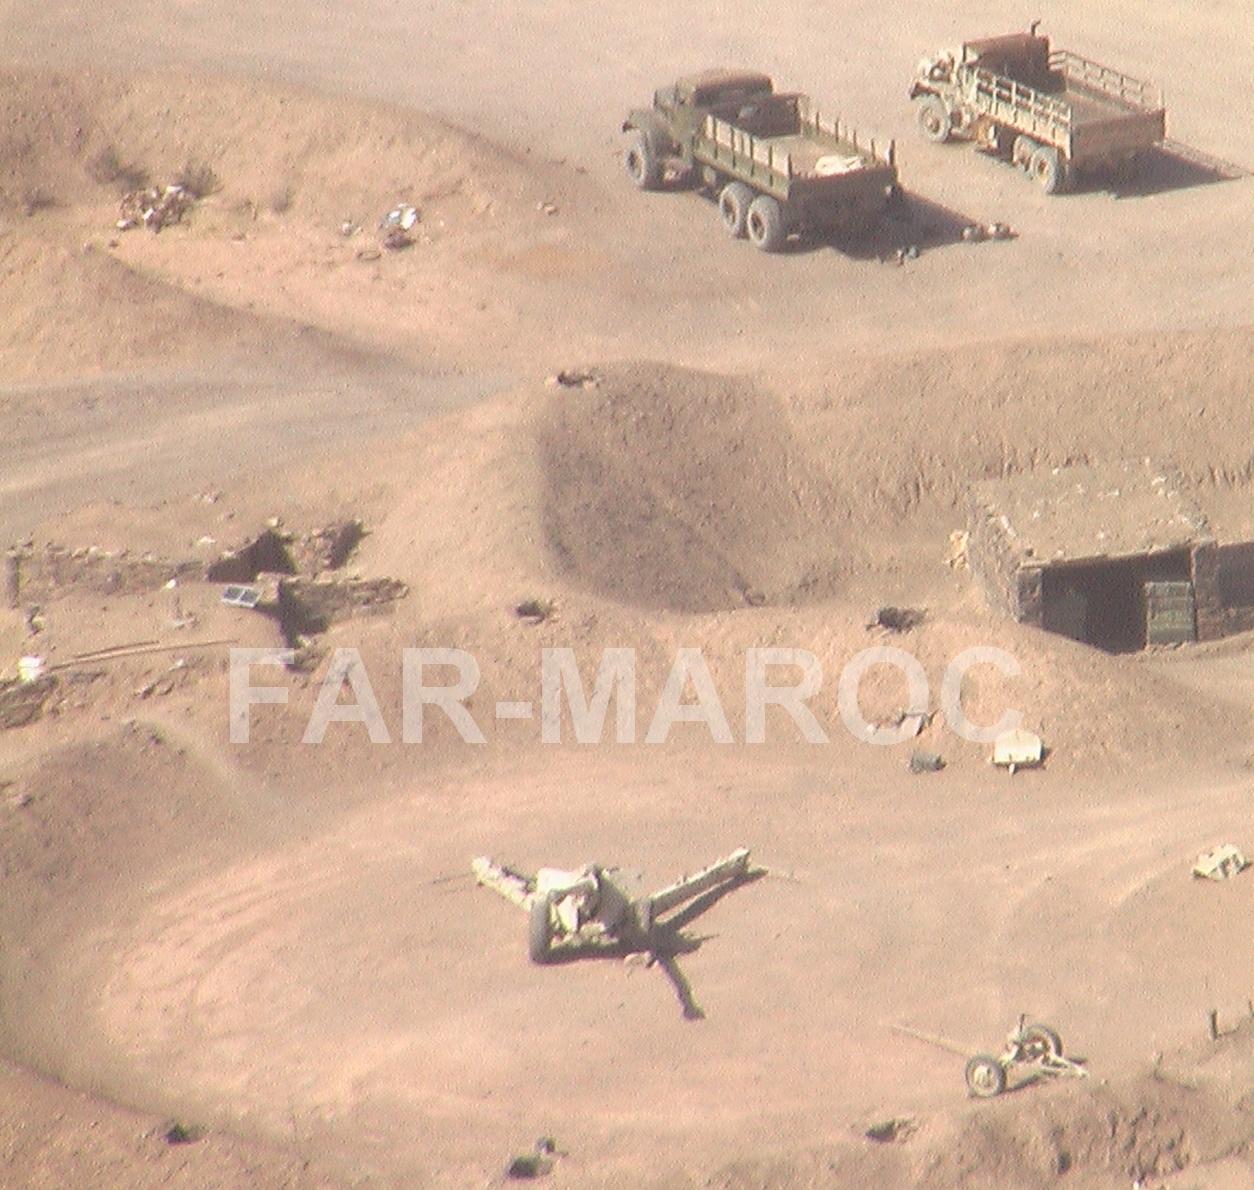 L'Artillerie Royale Marocaine / Royal Moroccan Artillery - Page 6 40865666363_6785a02153_o